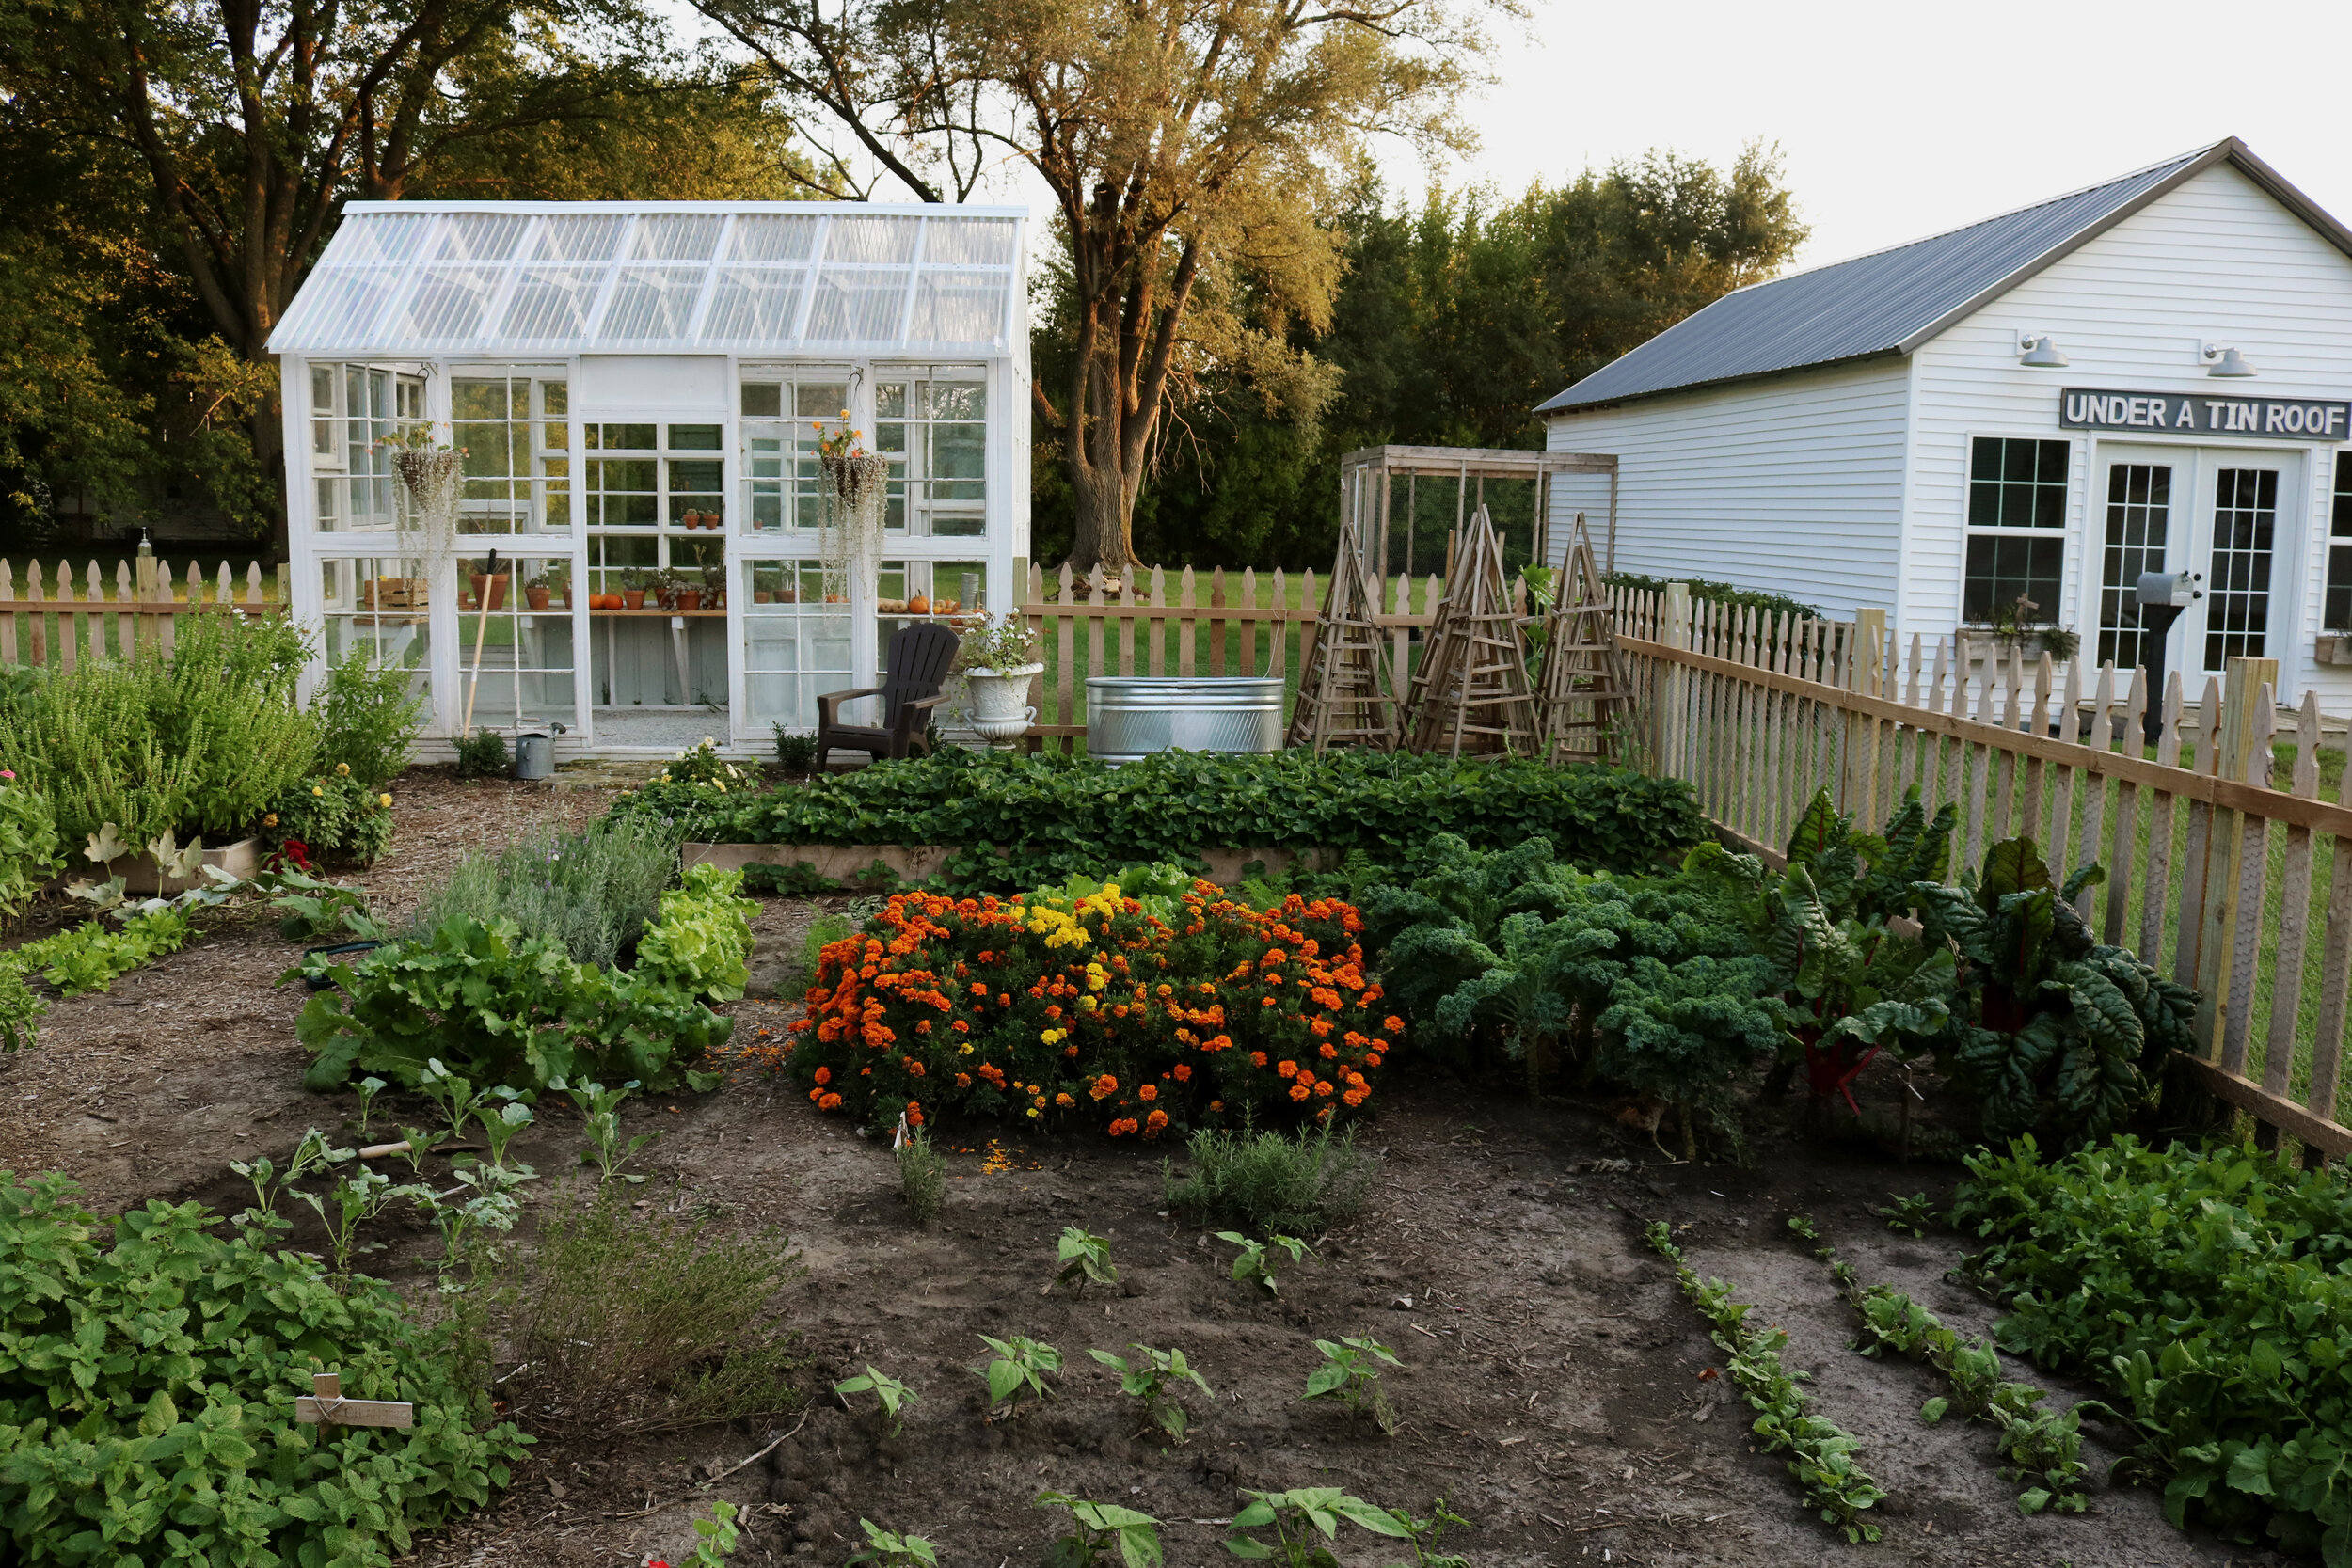 How To Make A Kitchen Garden Plan Under A Tin Roof